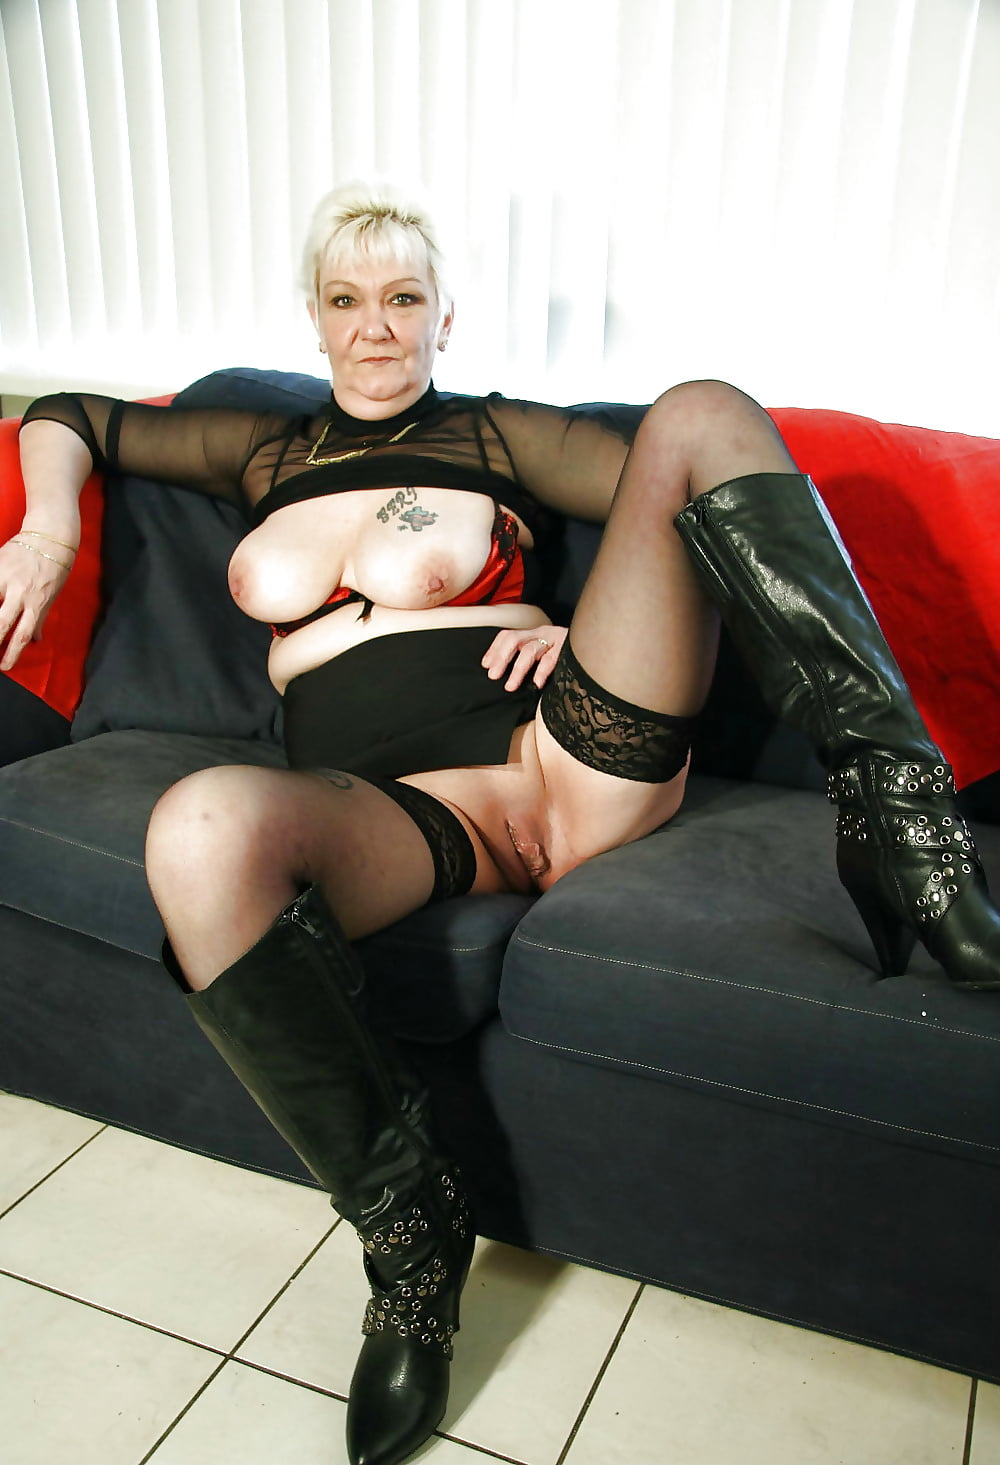 Grannies black stockings porn, james dean bisexual relationship